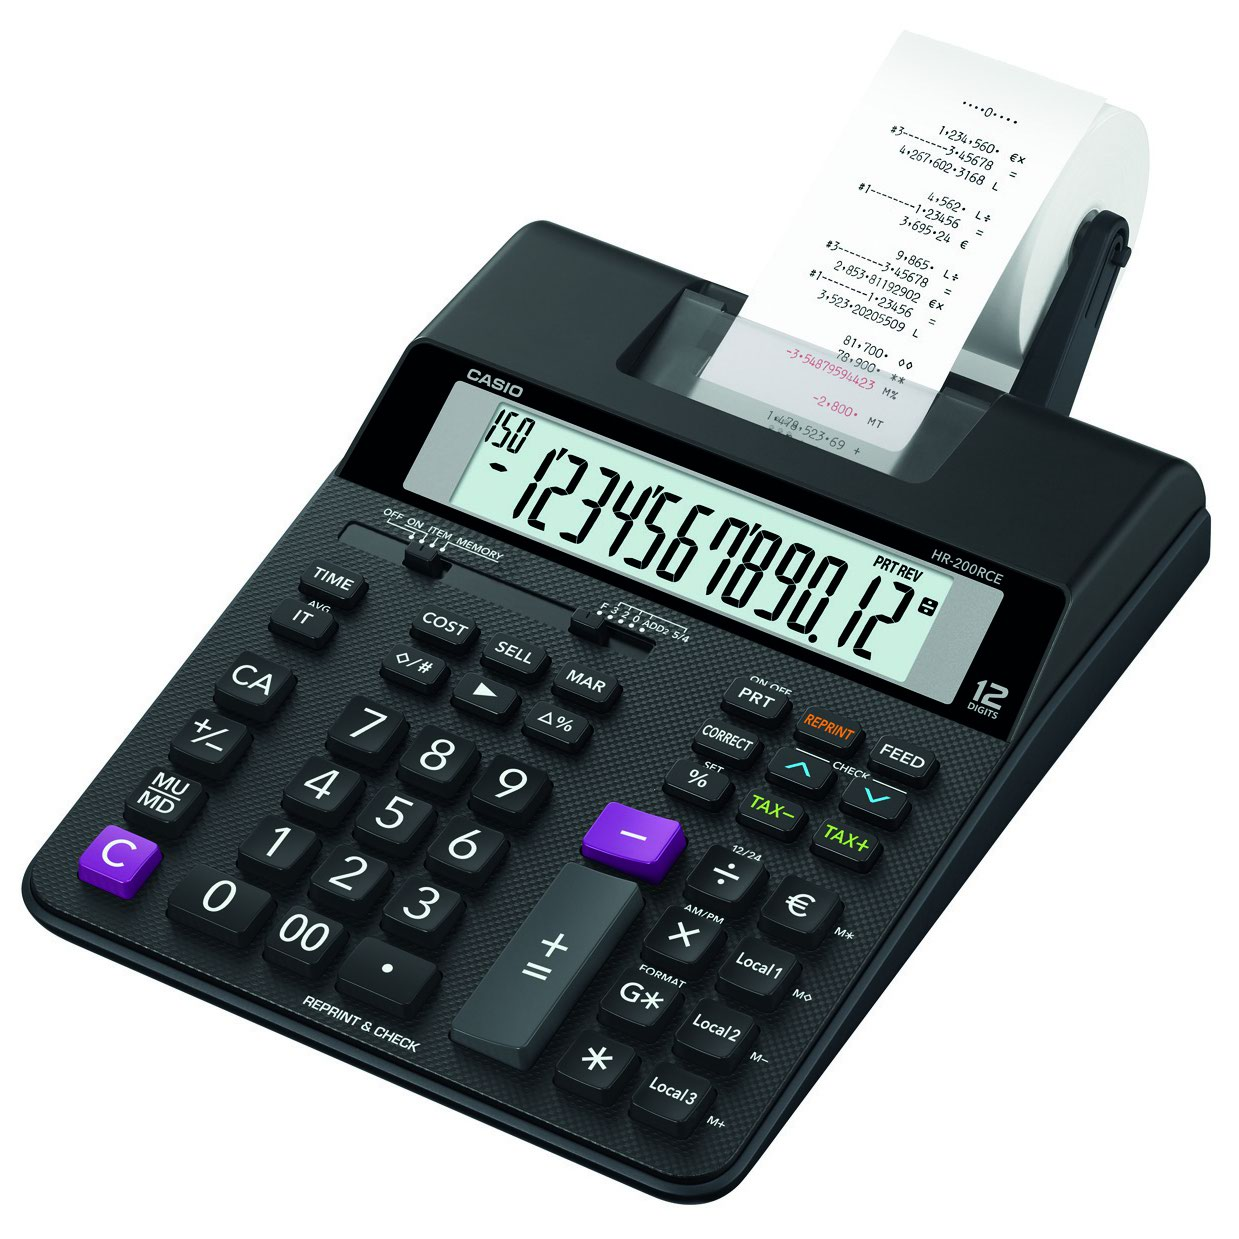 Casio HR-200RCE Printing Calculator 13 digit Display Black Ref HR-200RCE